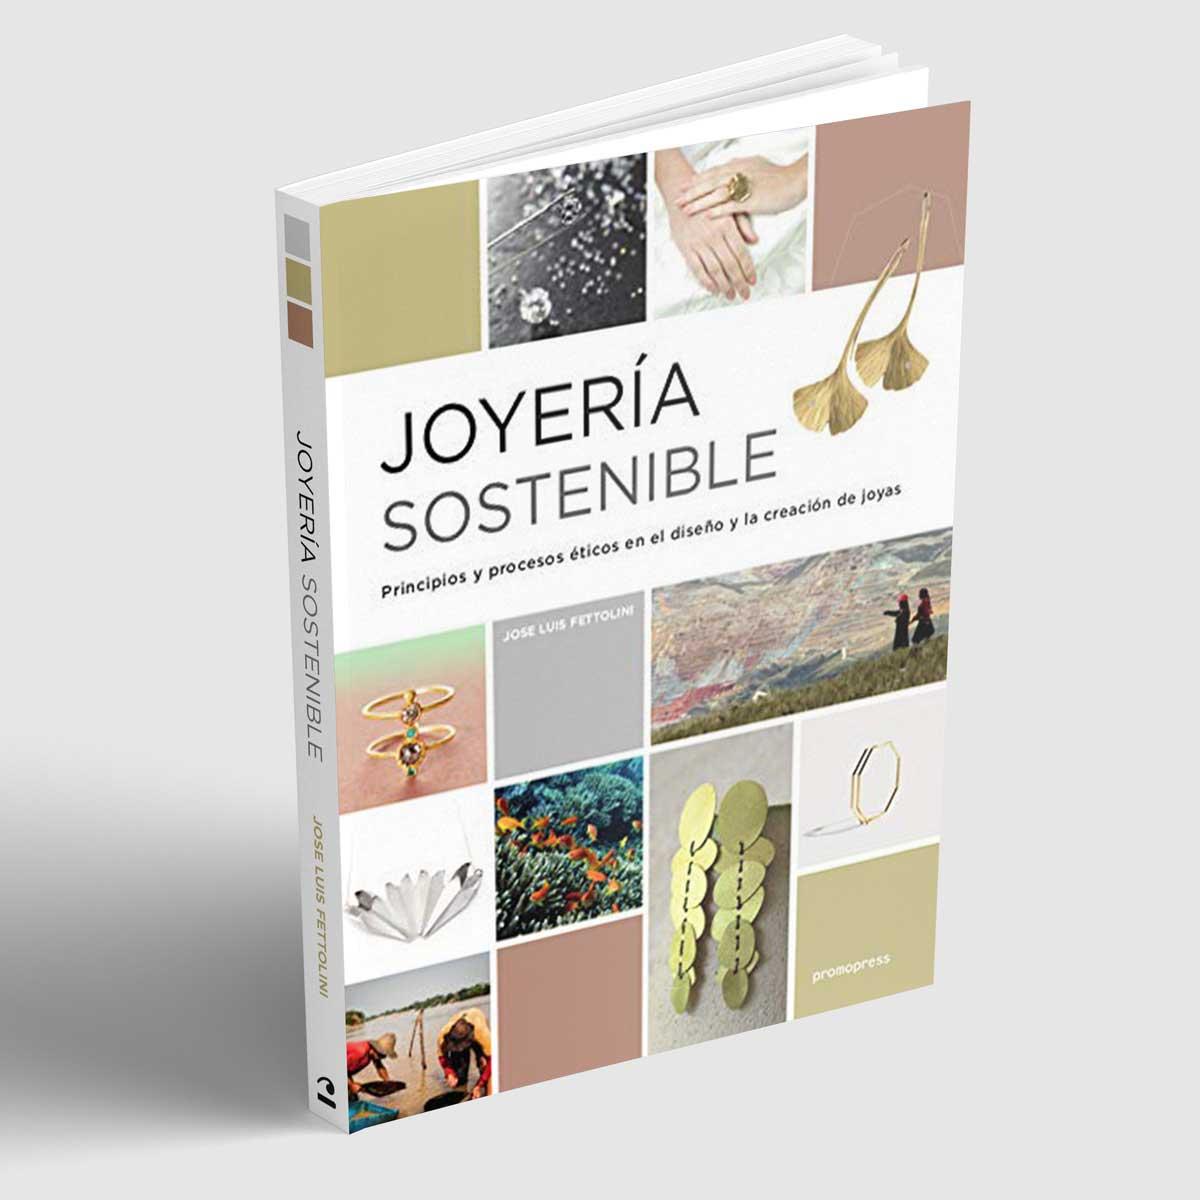 joyeria-sostenible